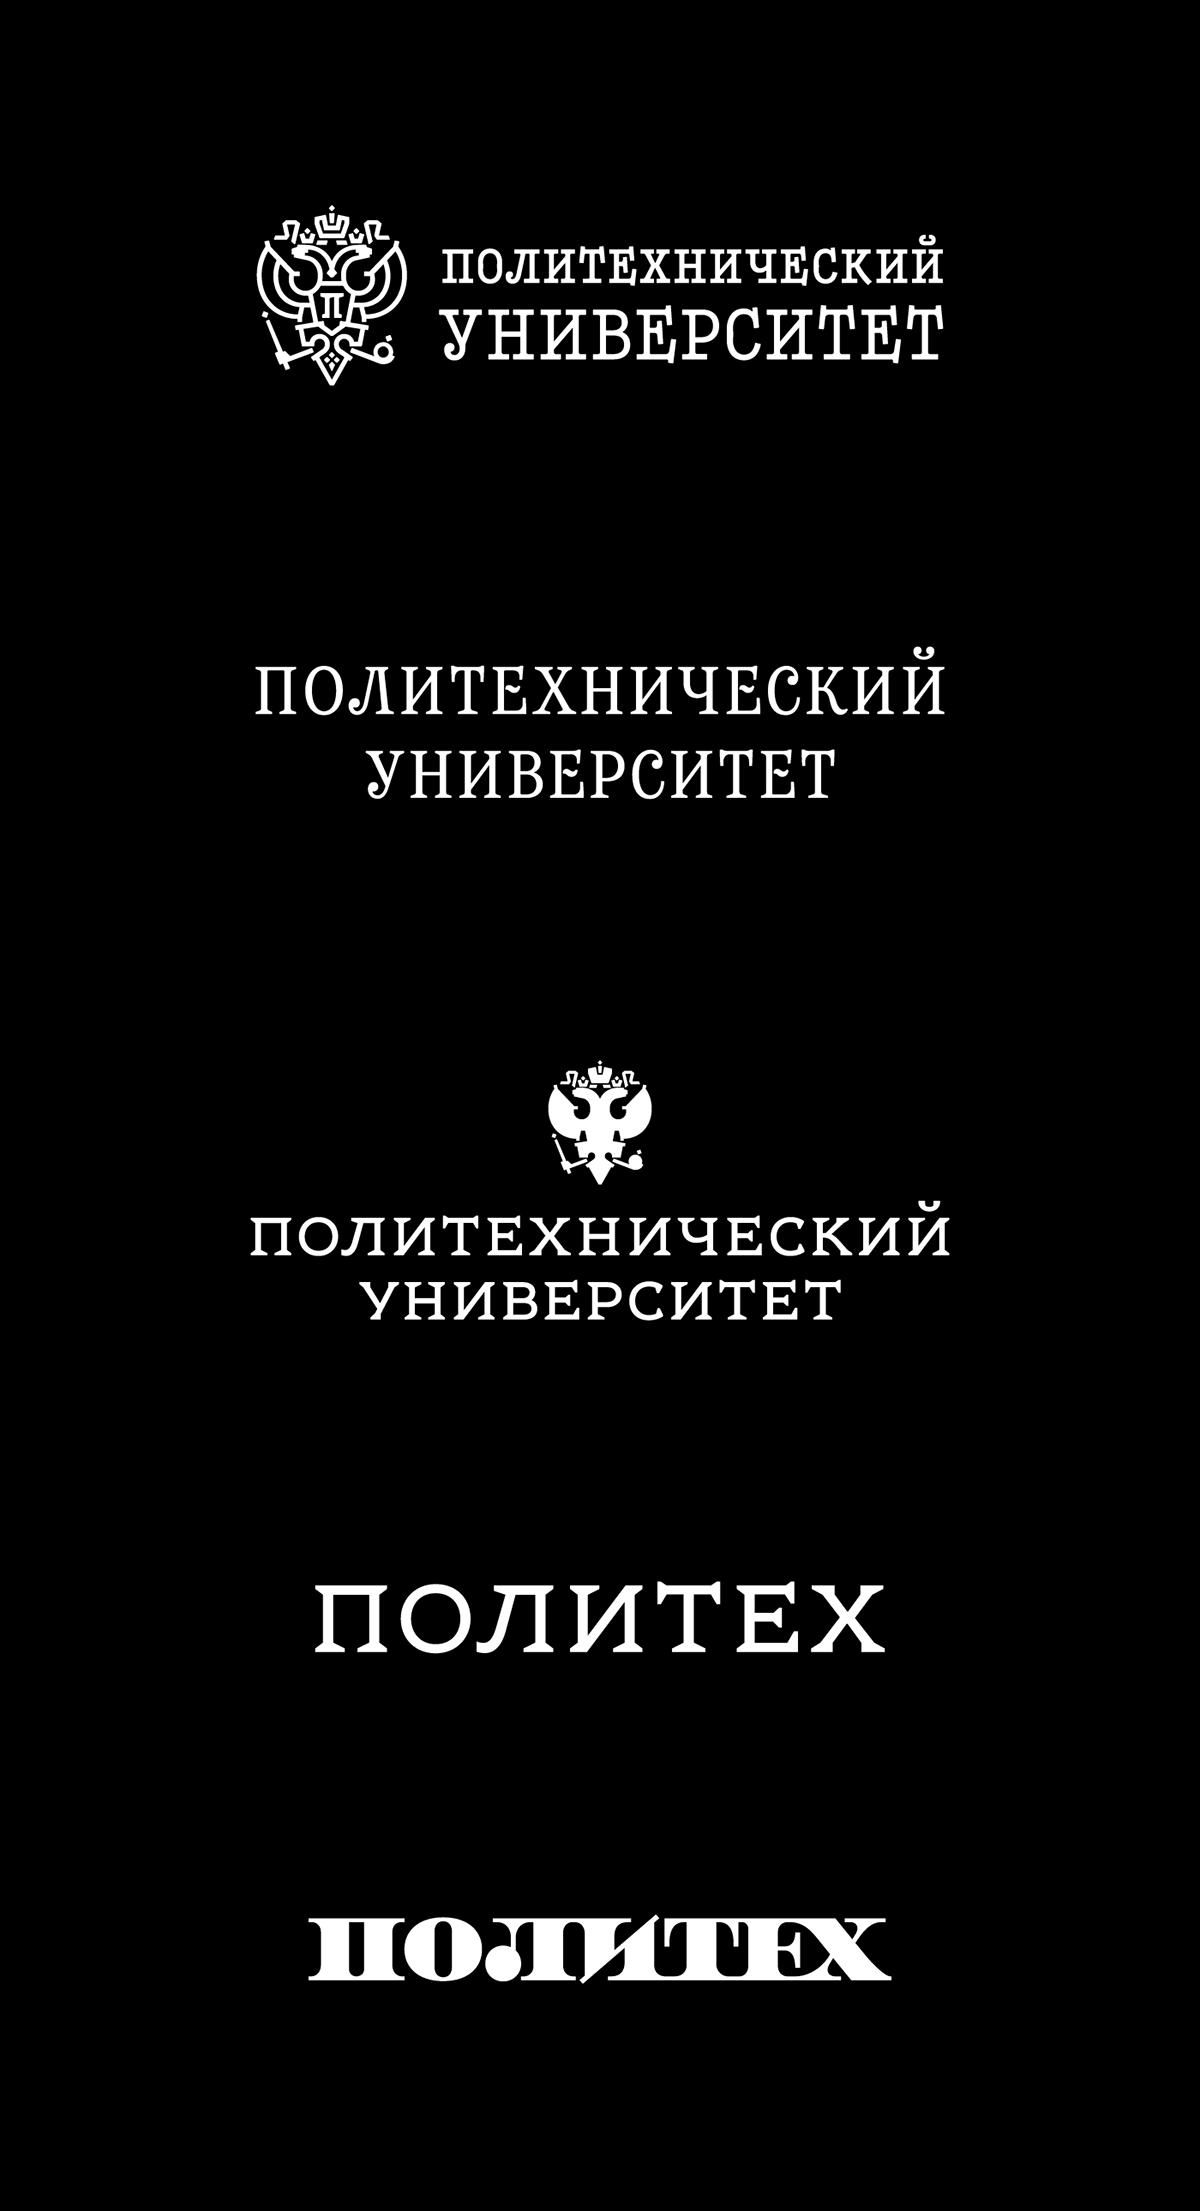 lettering logo logos леттеринг Cyrillic кириллица